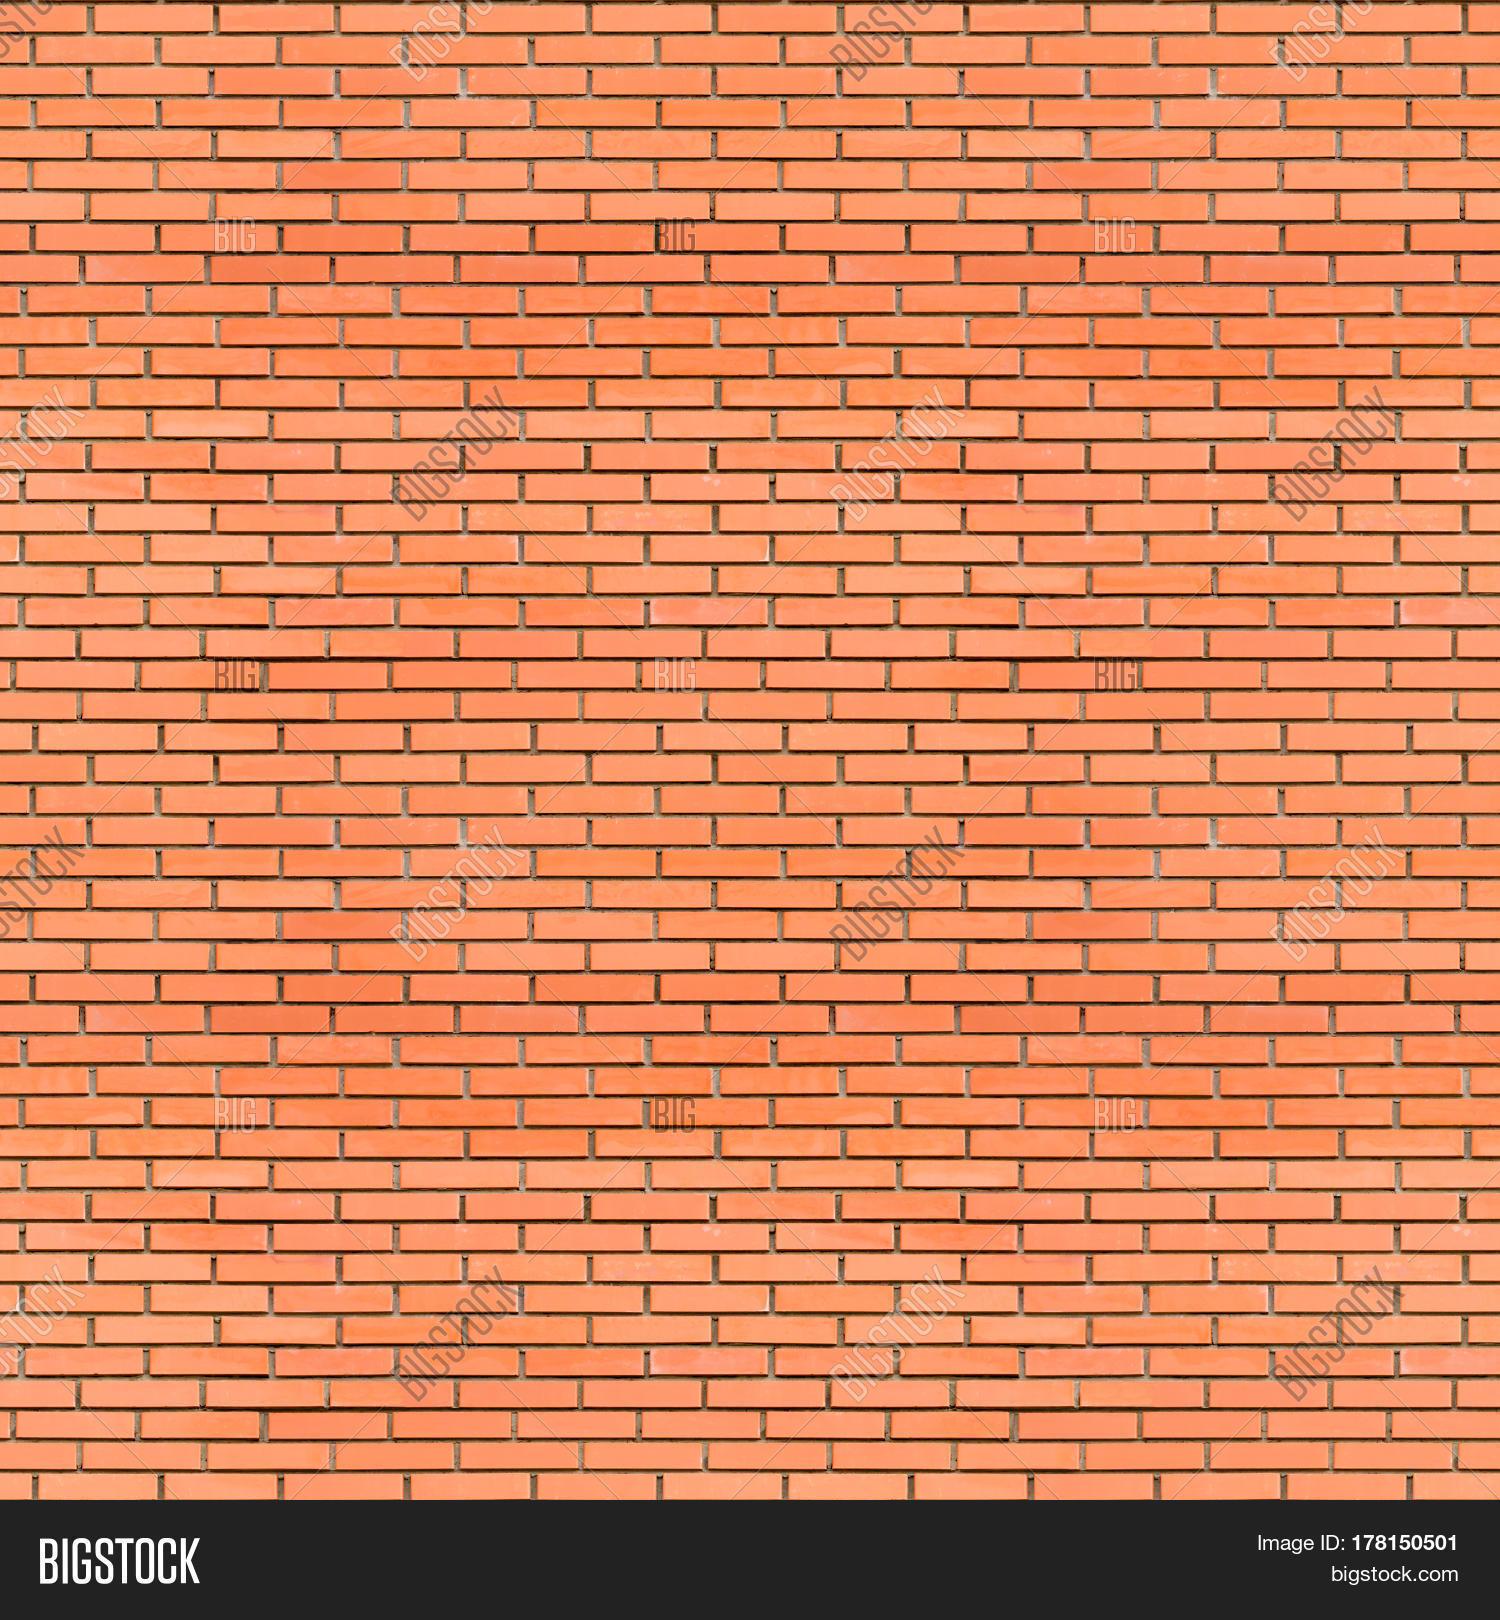 Red Bricks Wall Seamless Texture - Image & Photo | Bigstock